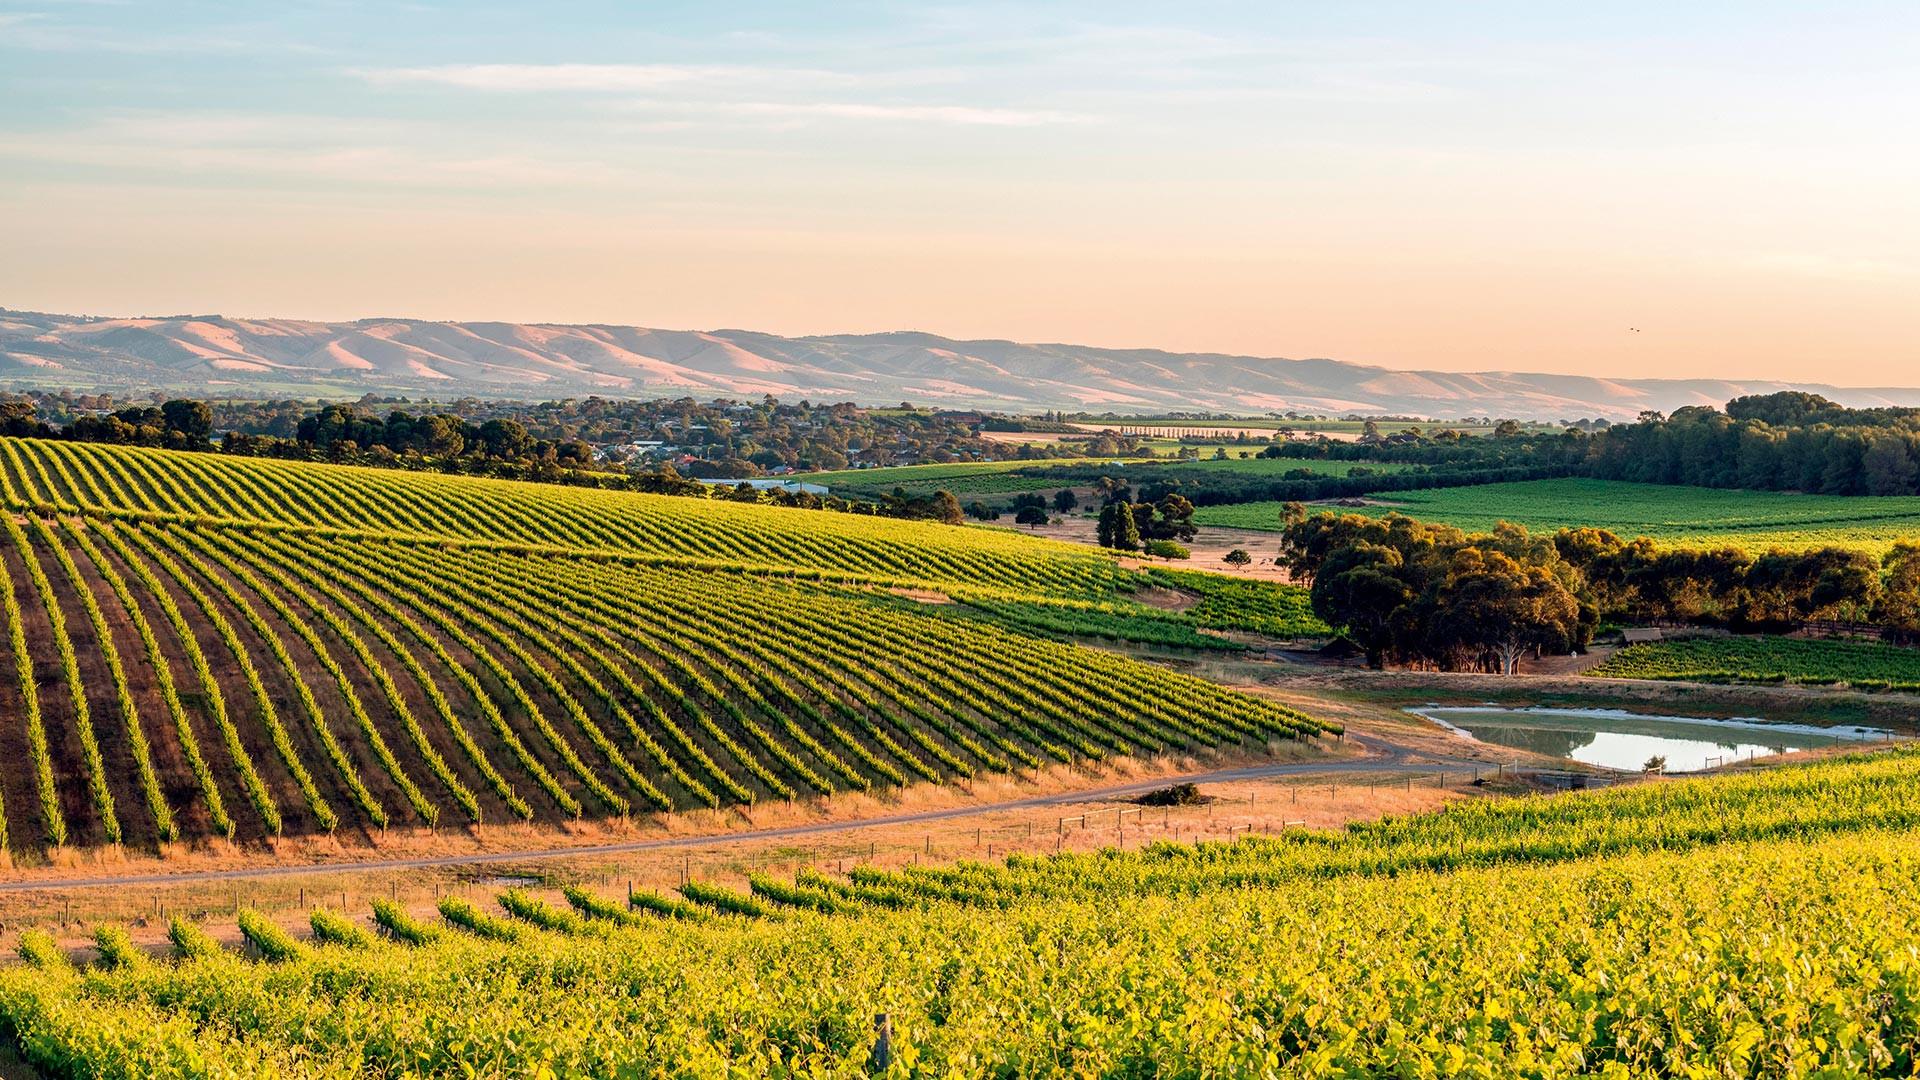 McLaren Vale, South Australia wine growing region